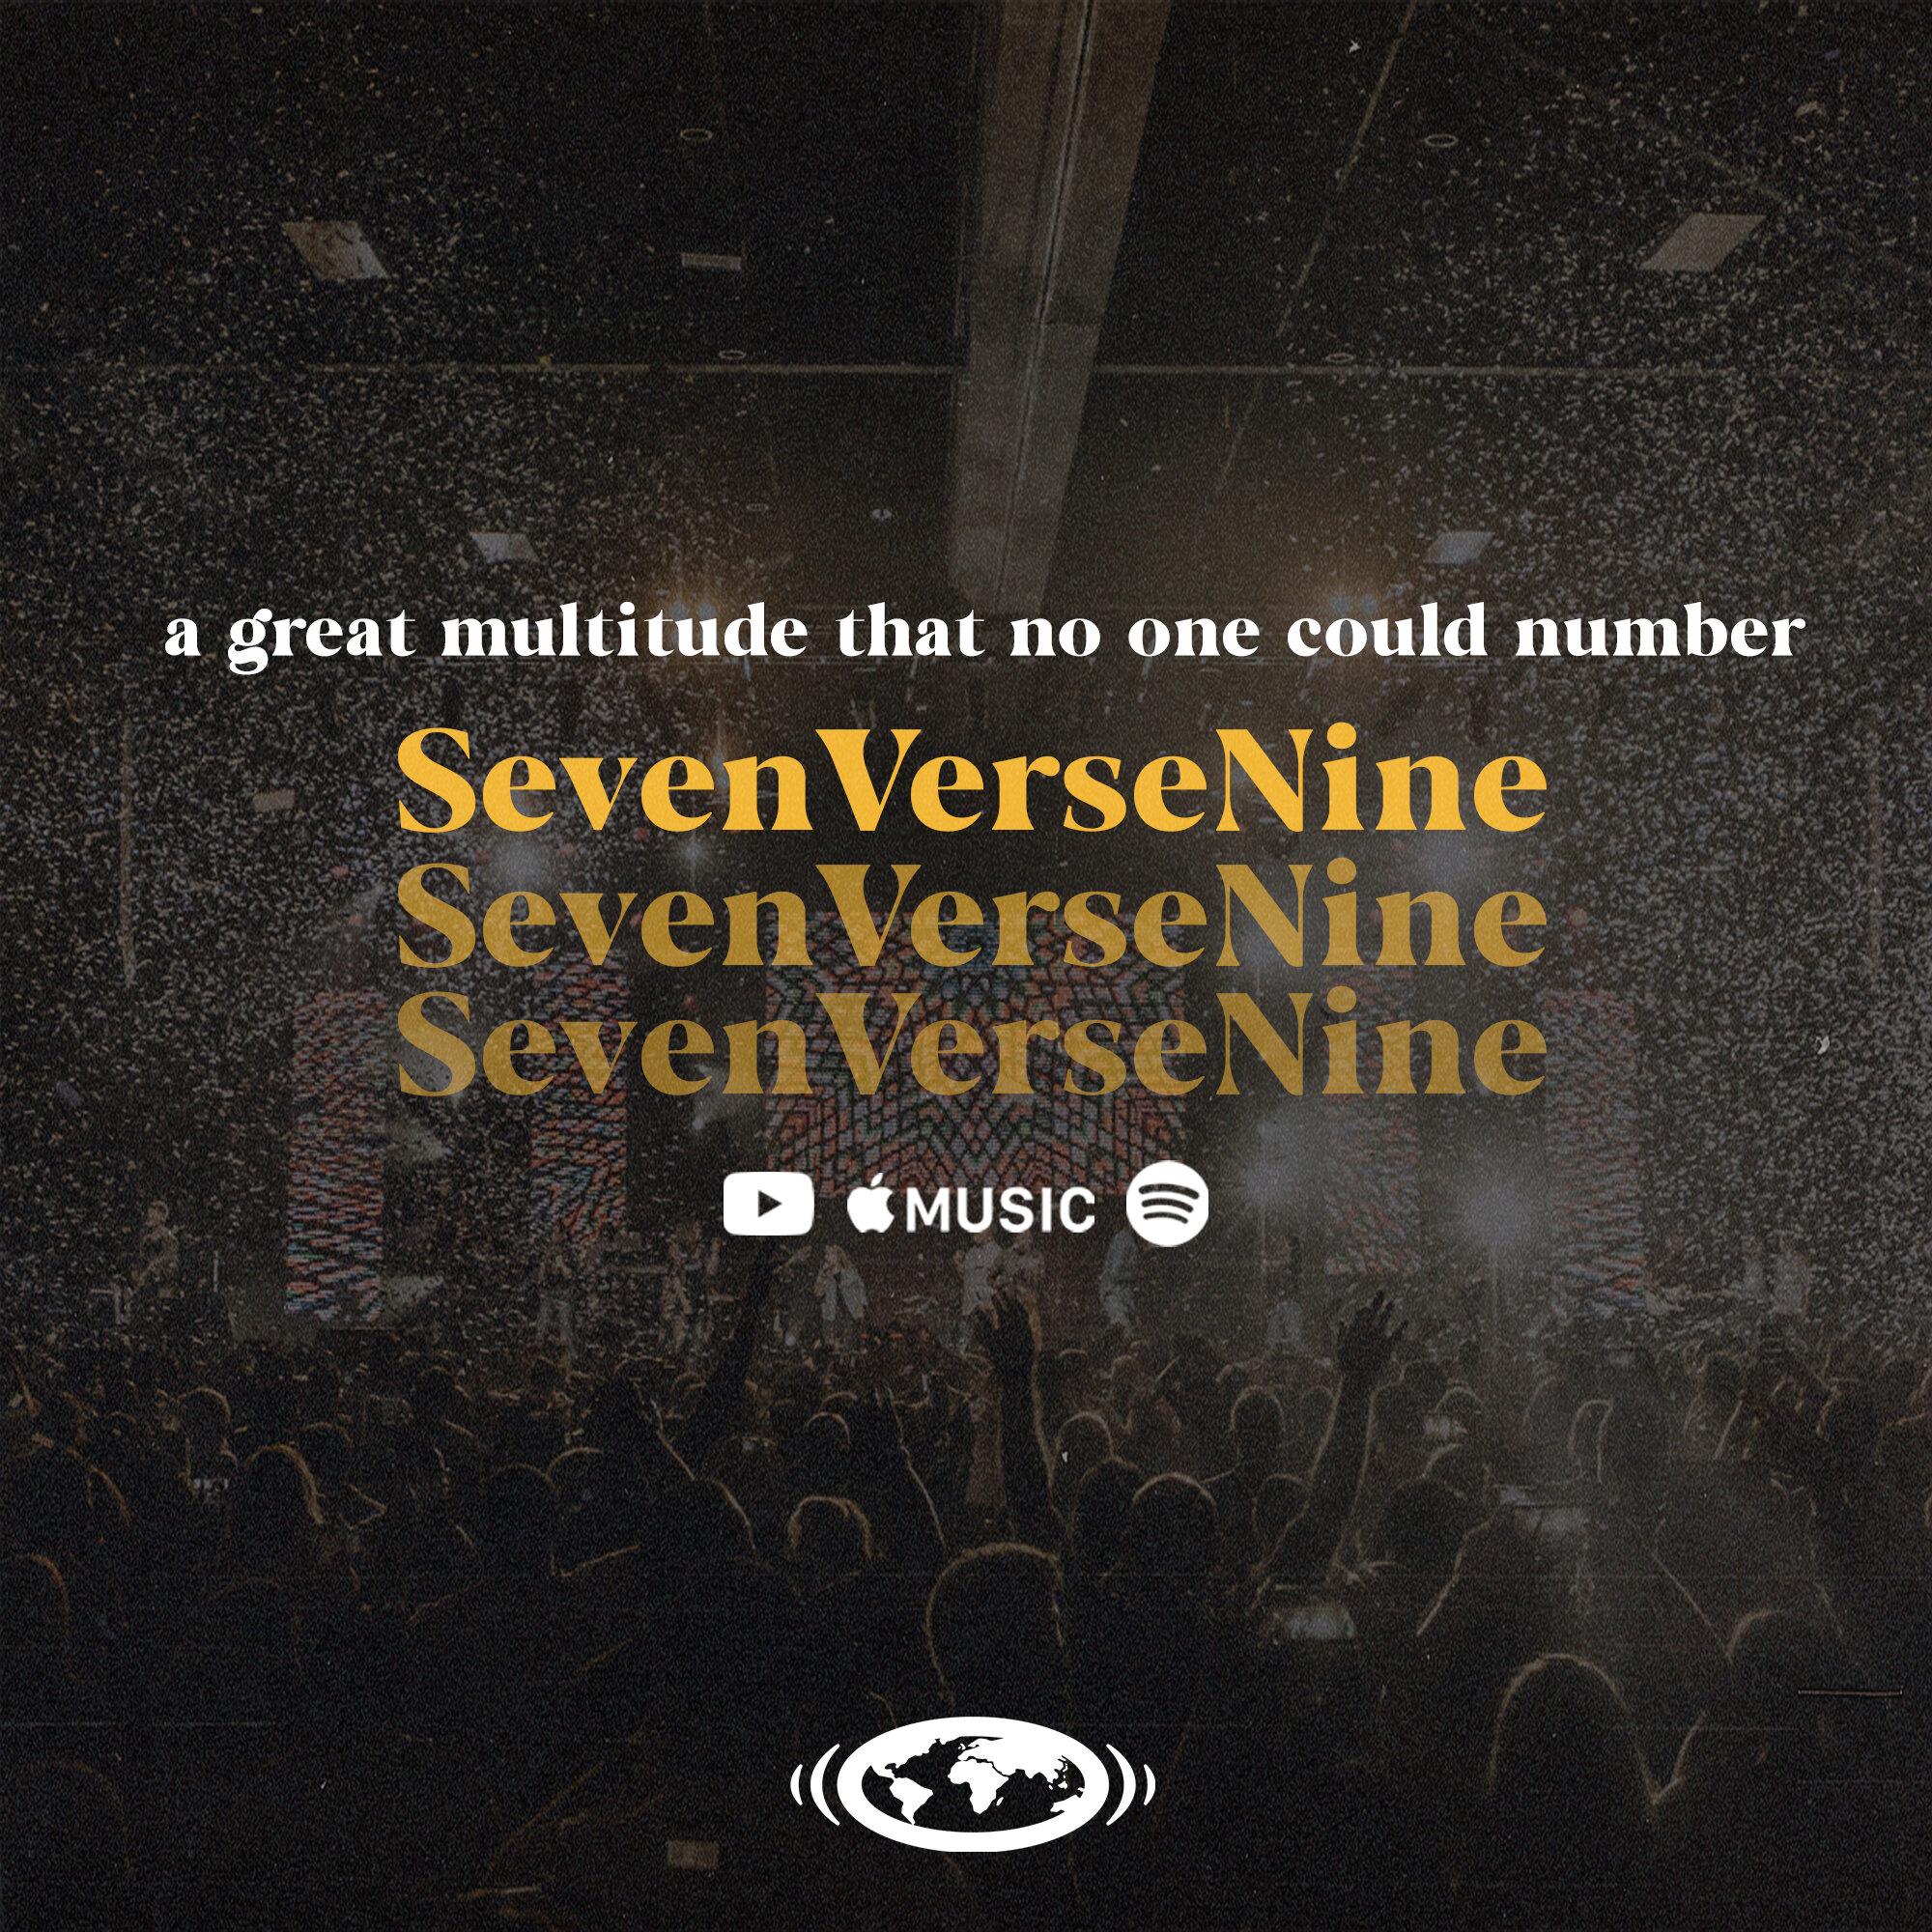 SevenVerseNine_A great Multitude Square Graphic.jpg